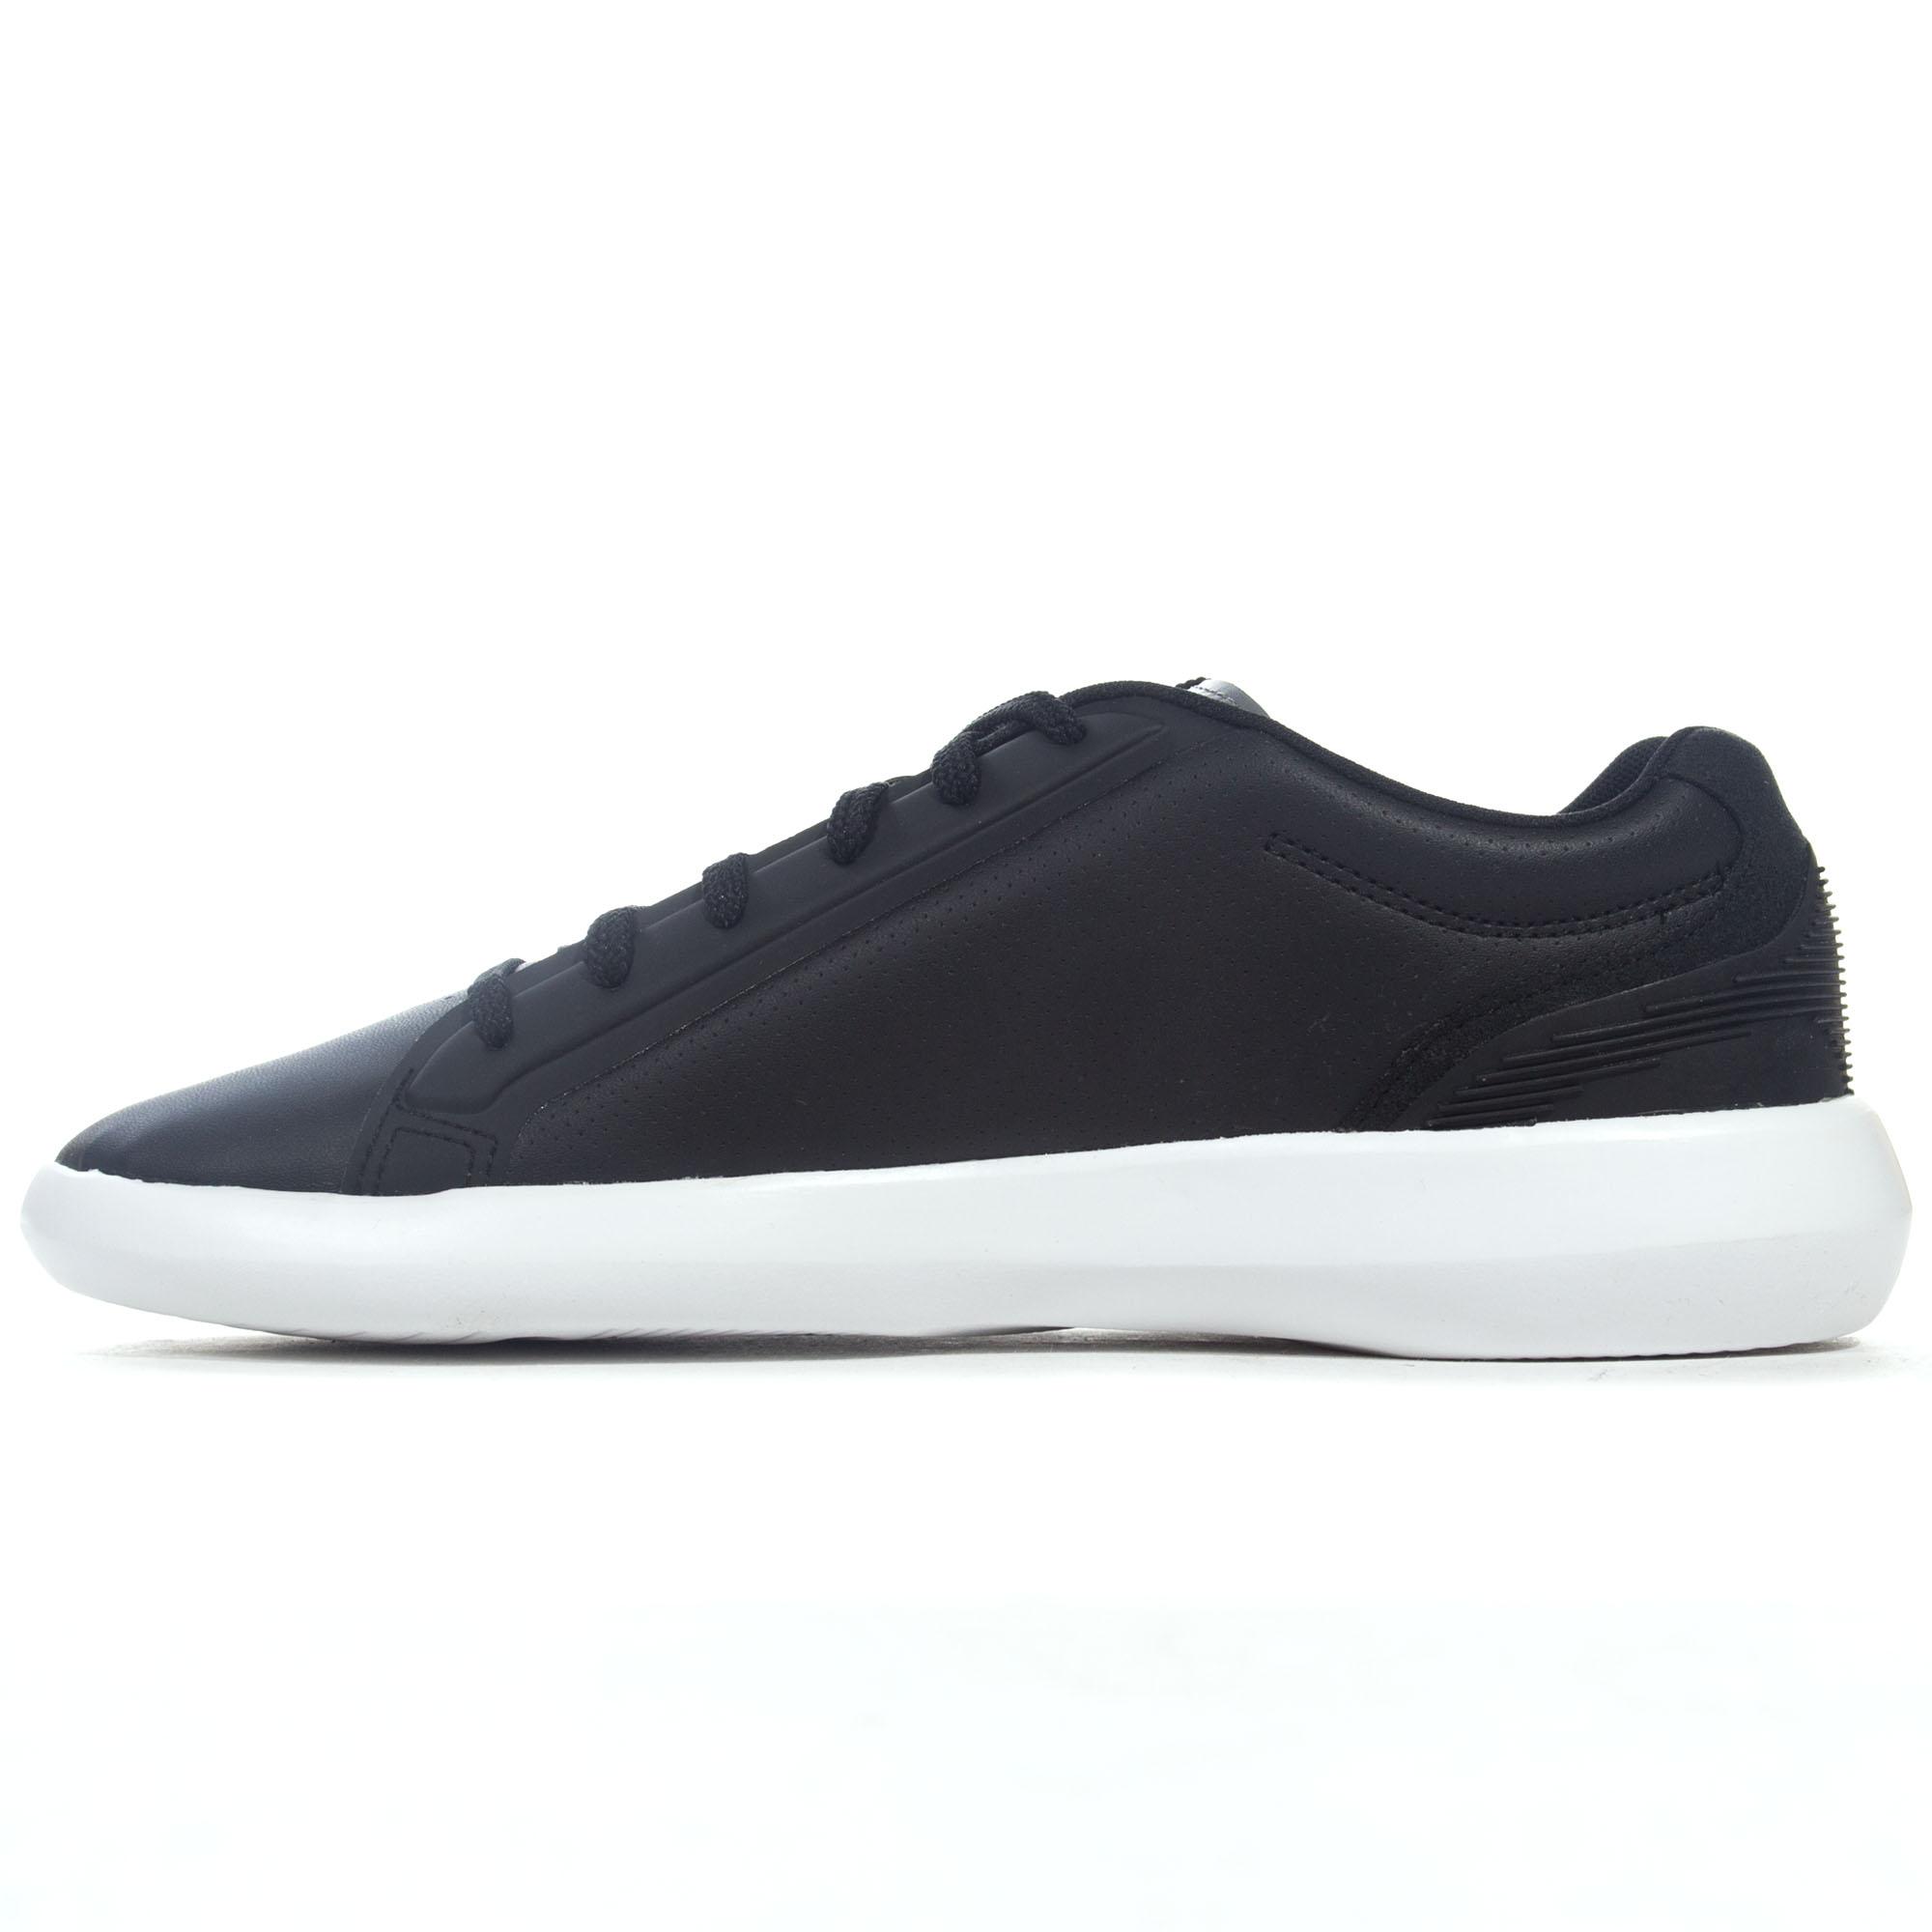 48d2fa7d3f7a99 Lacoste Avantor 318 3 SPM Mens Sports Fashion Trainer Shoe Black White